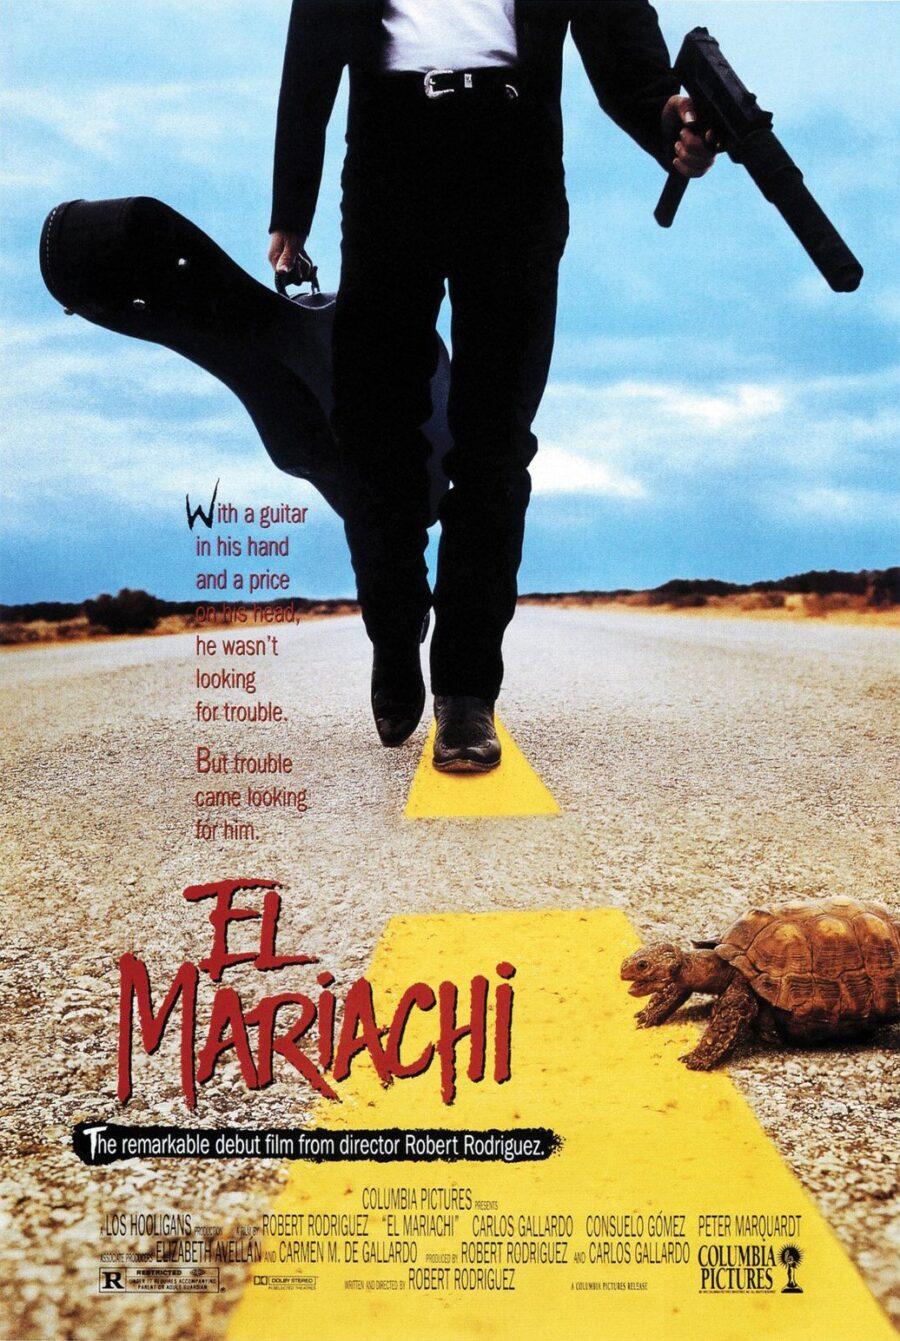 Robert Rodriguez movie